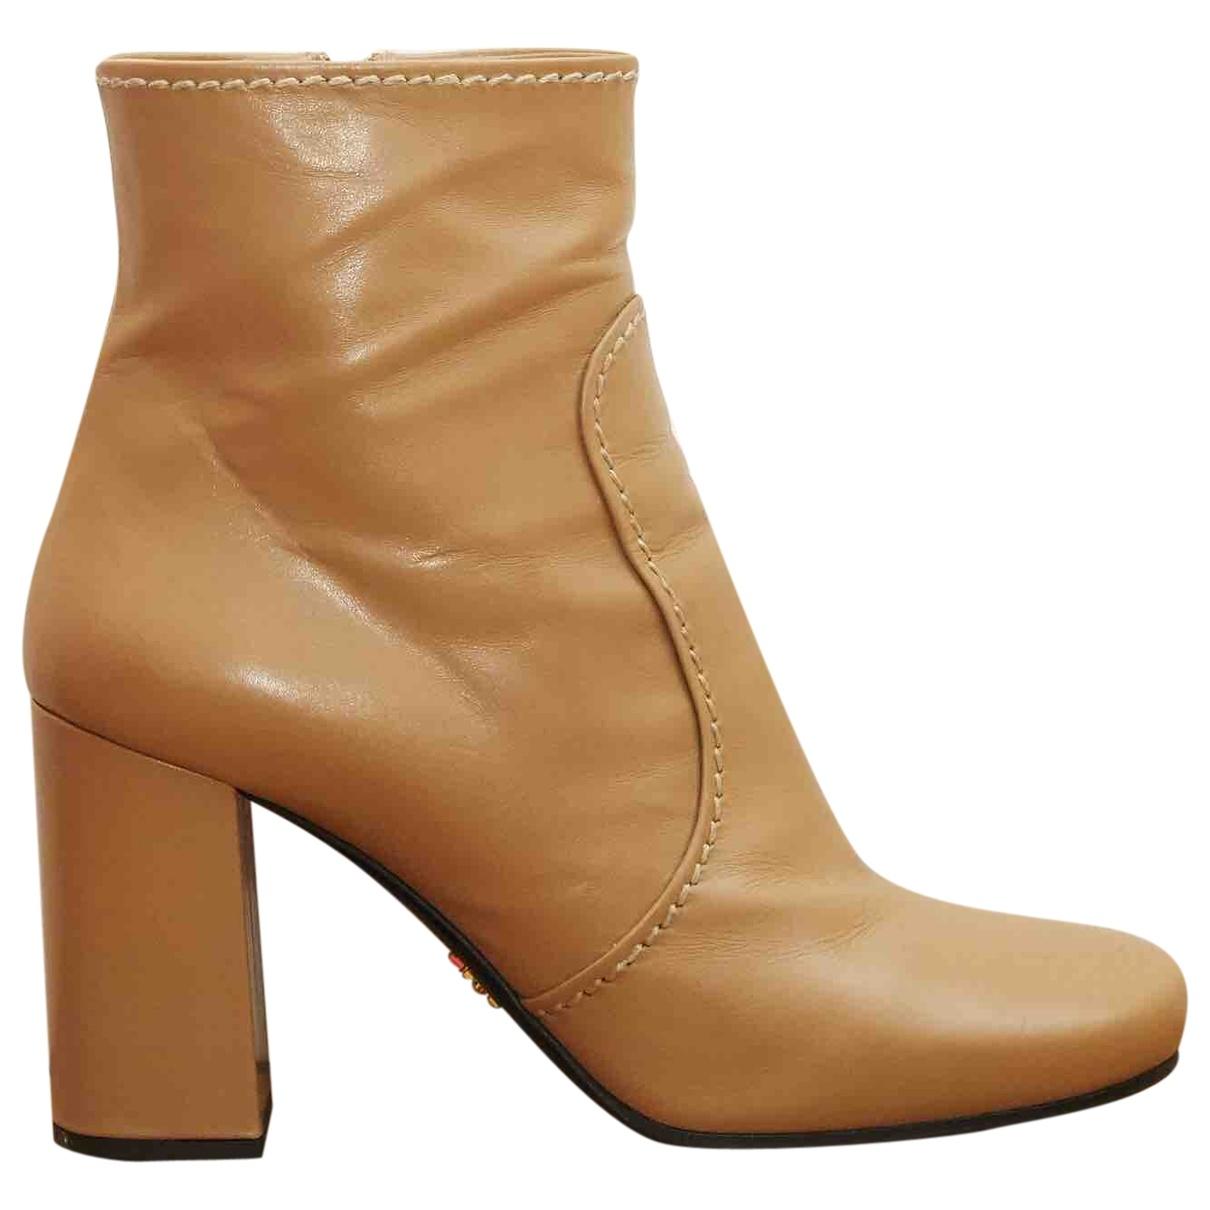 Prada \N Beige Leather Ankle boots for Women 38 EU